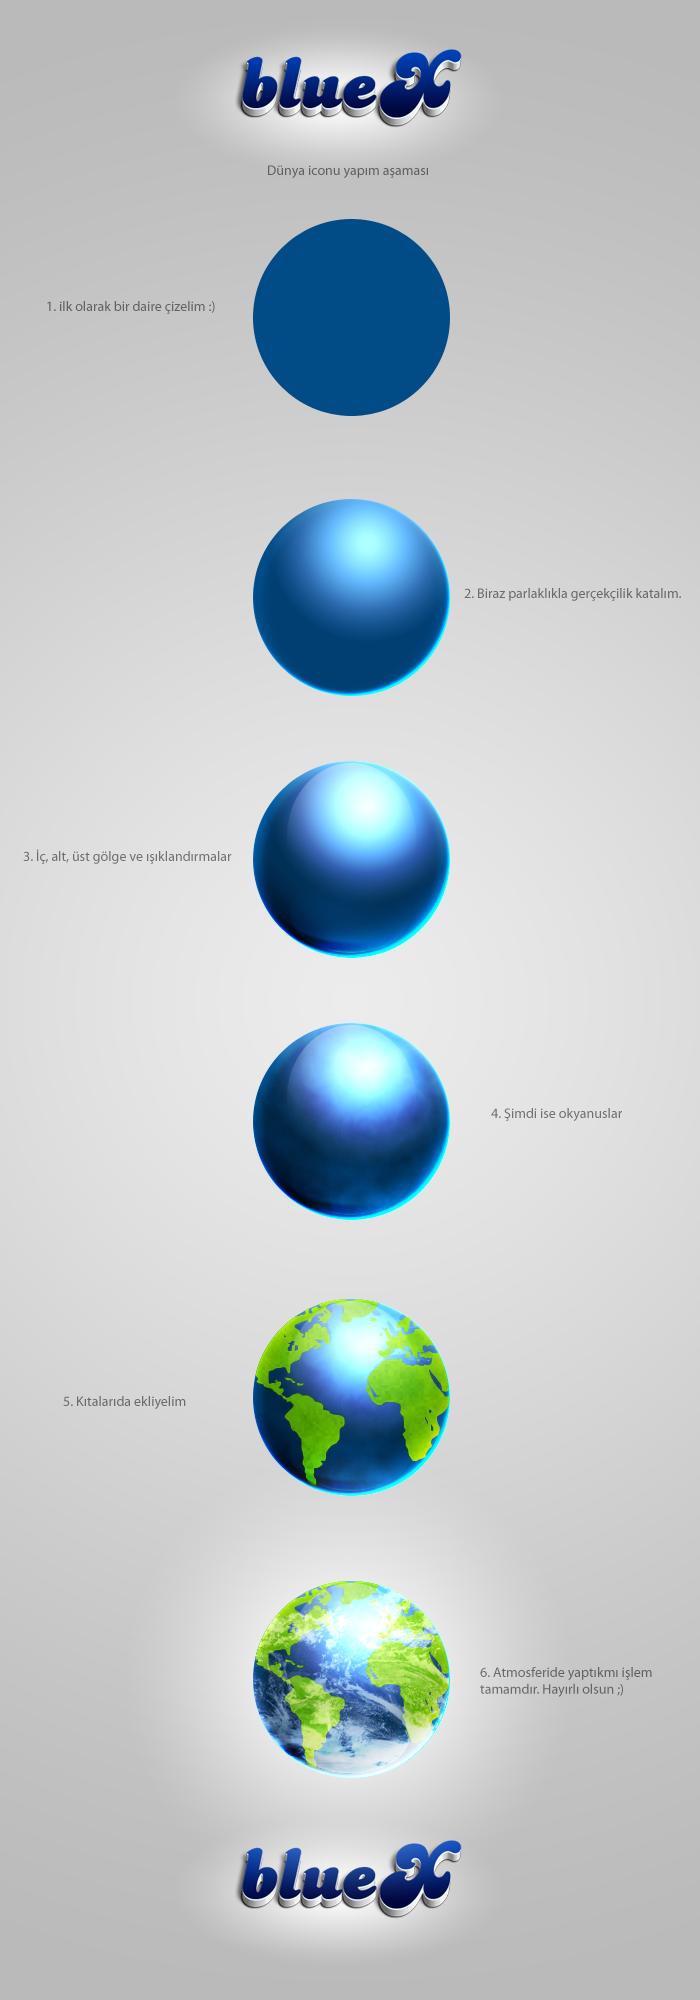 Making of Dünya iconu :) BlueX